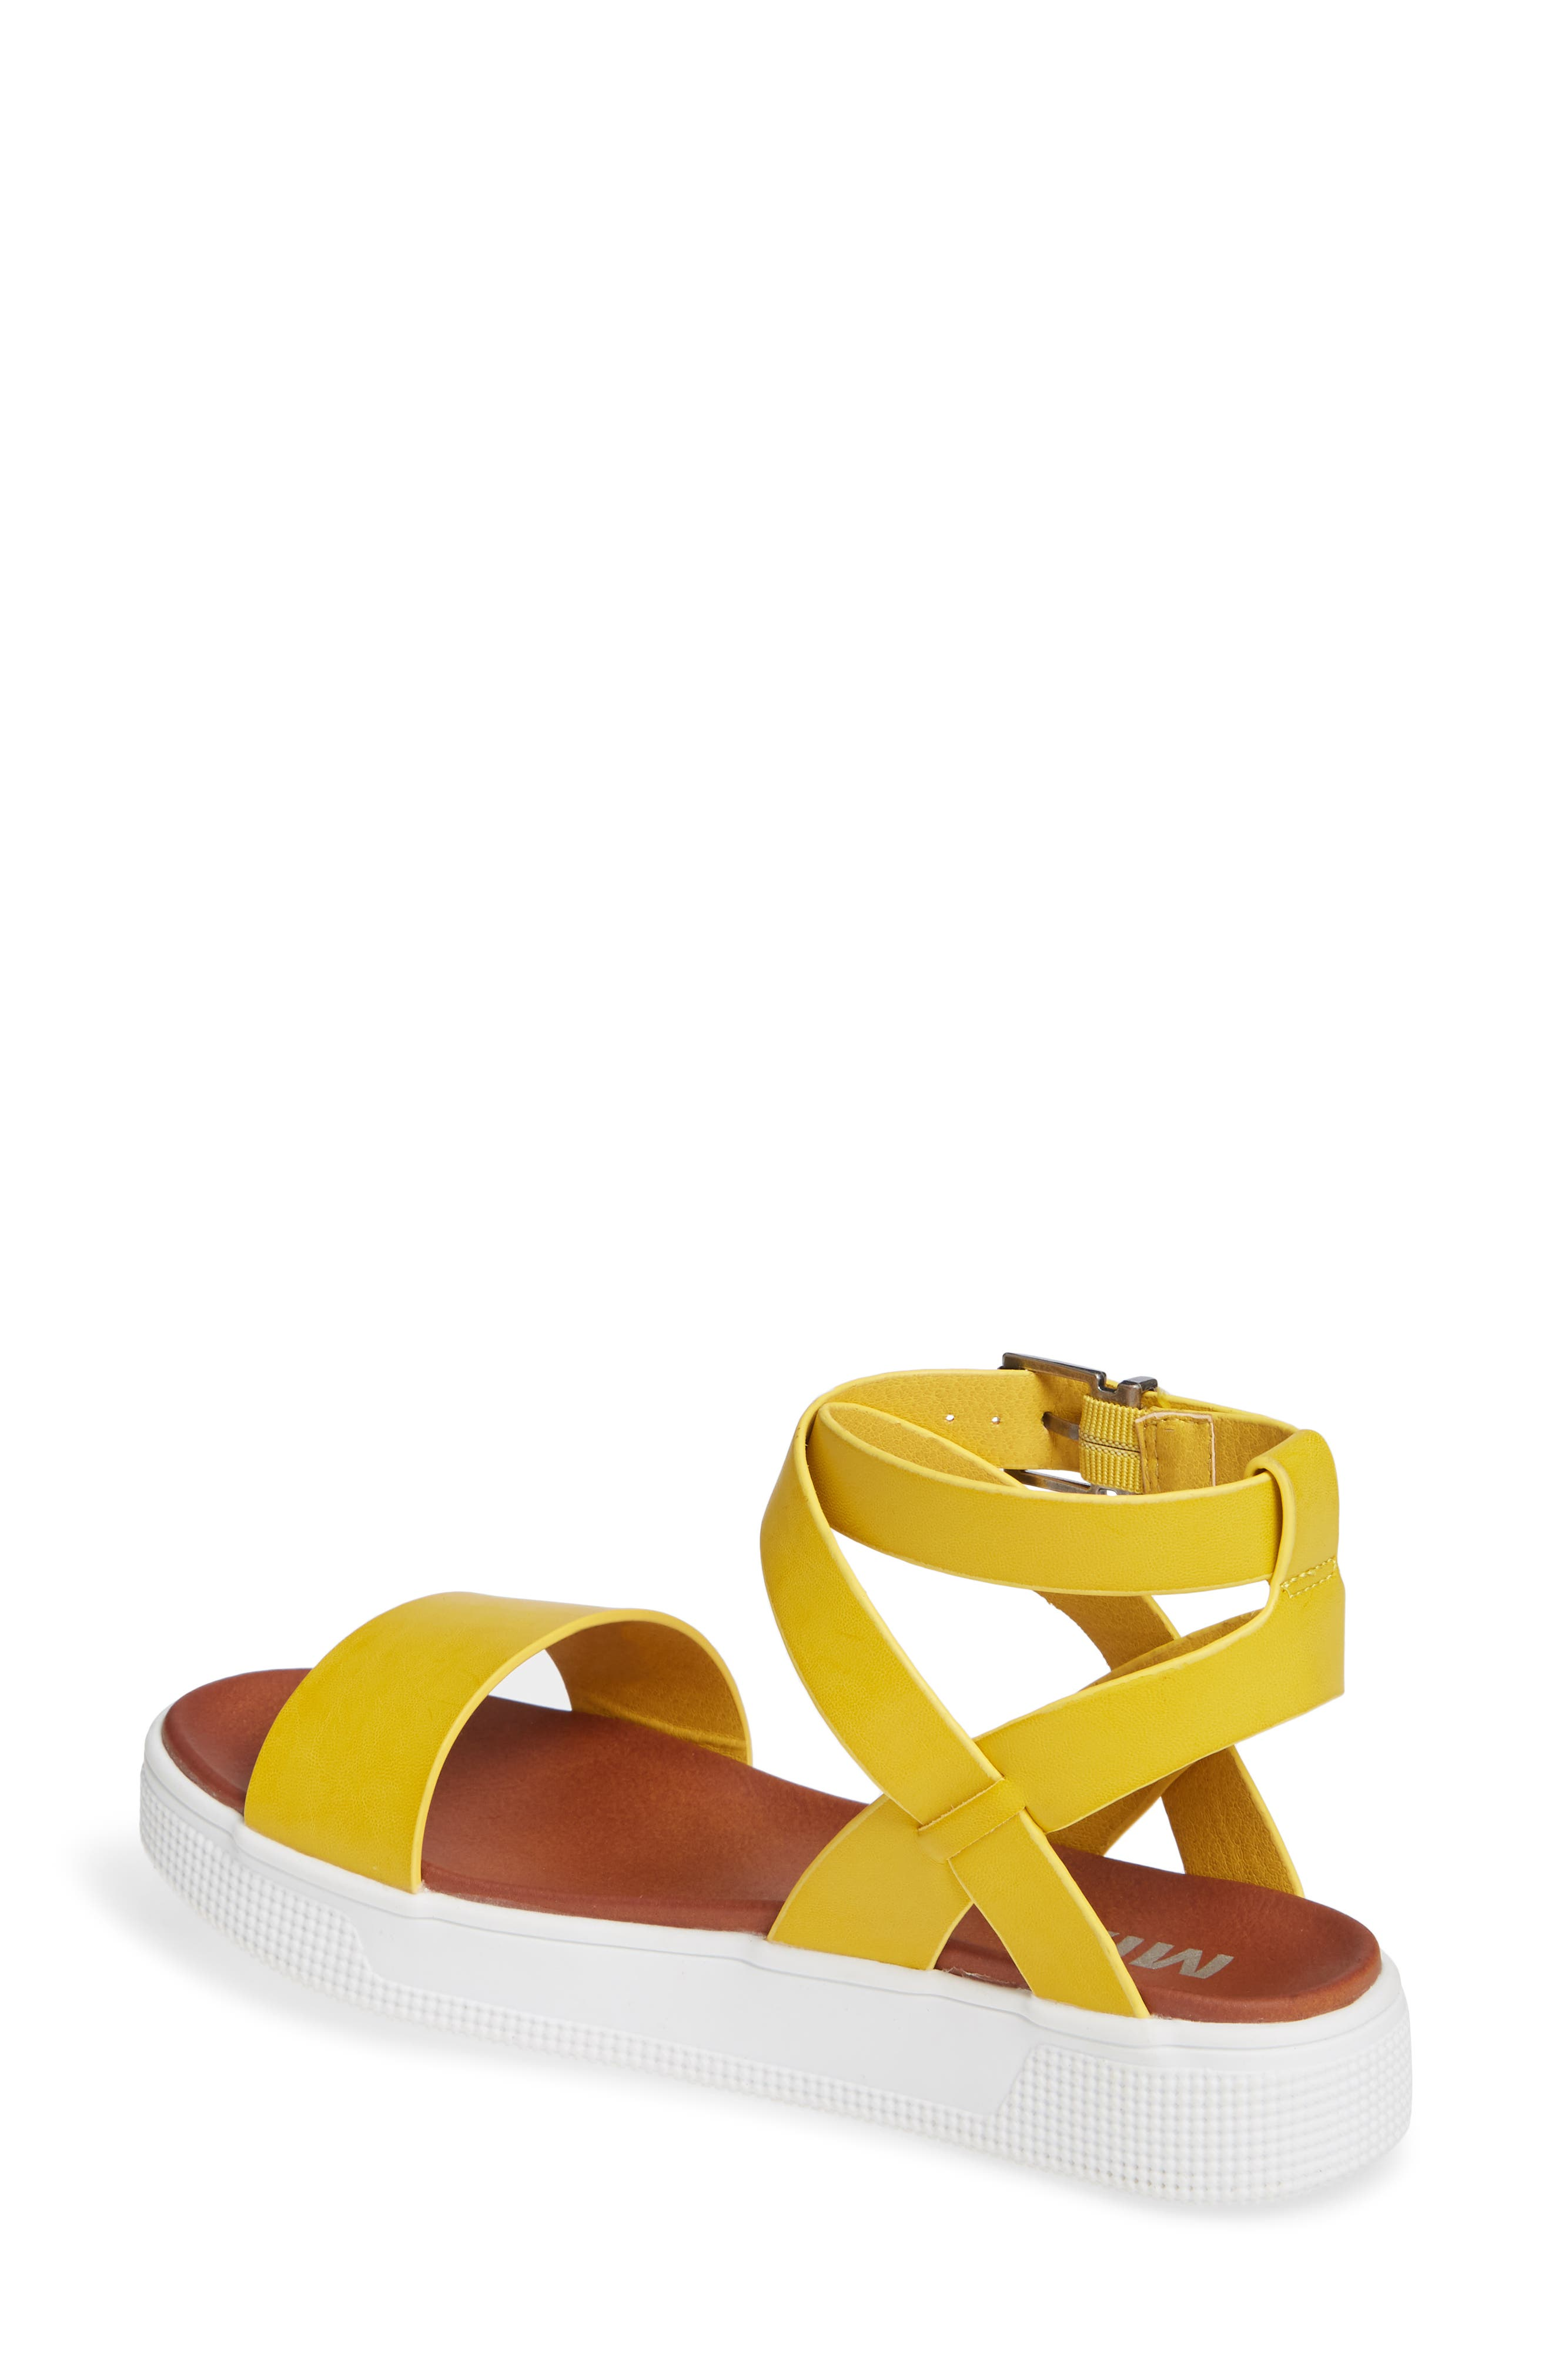 Calla Platform Sandal,                             Alternate thumbnail 2, color,                             YELLOW FAUX LEATHER